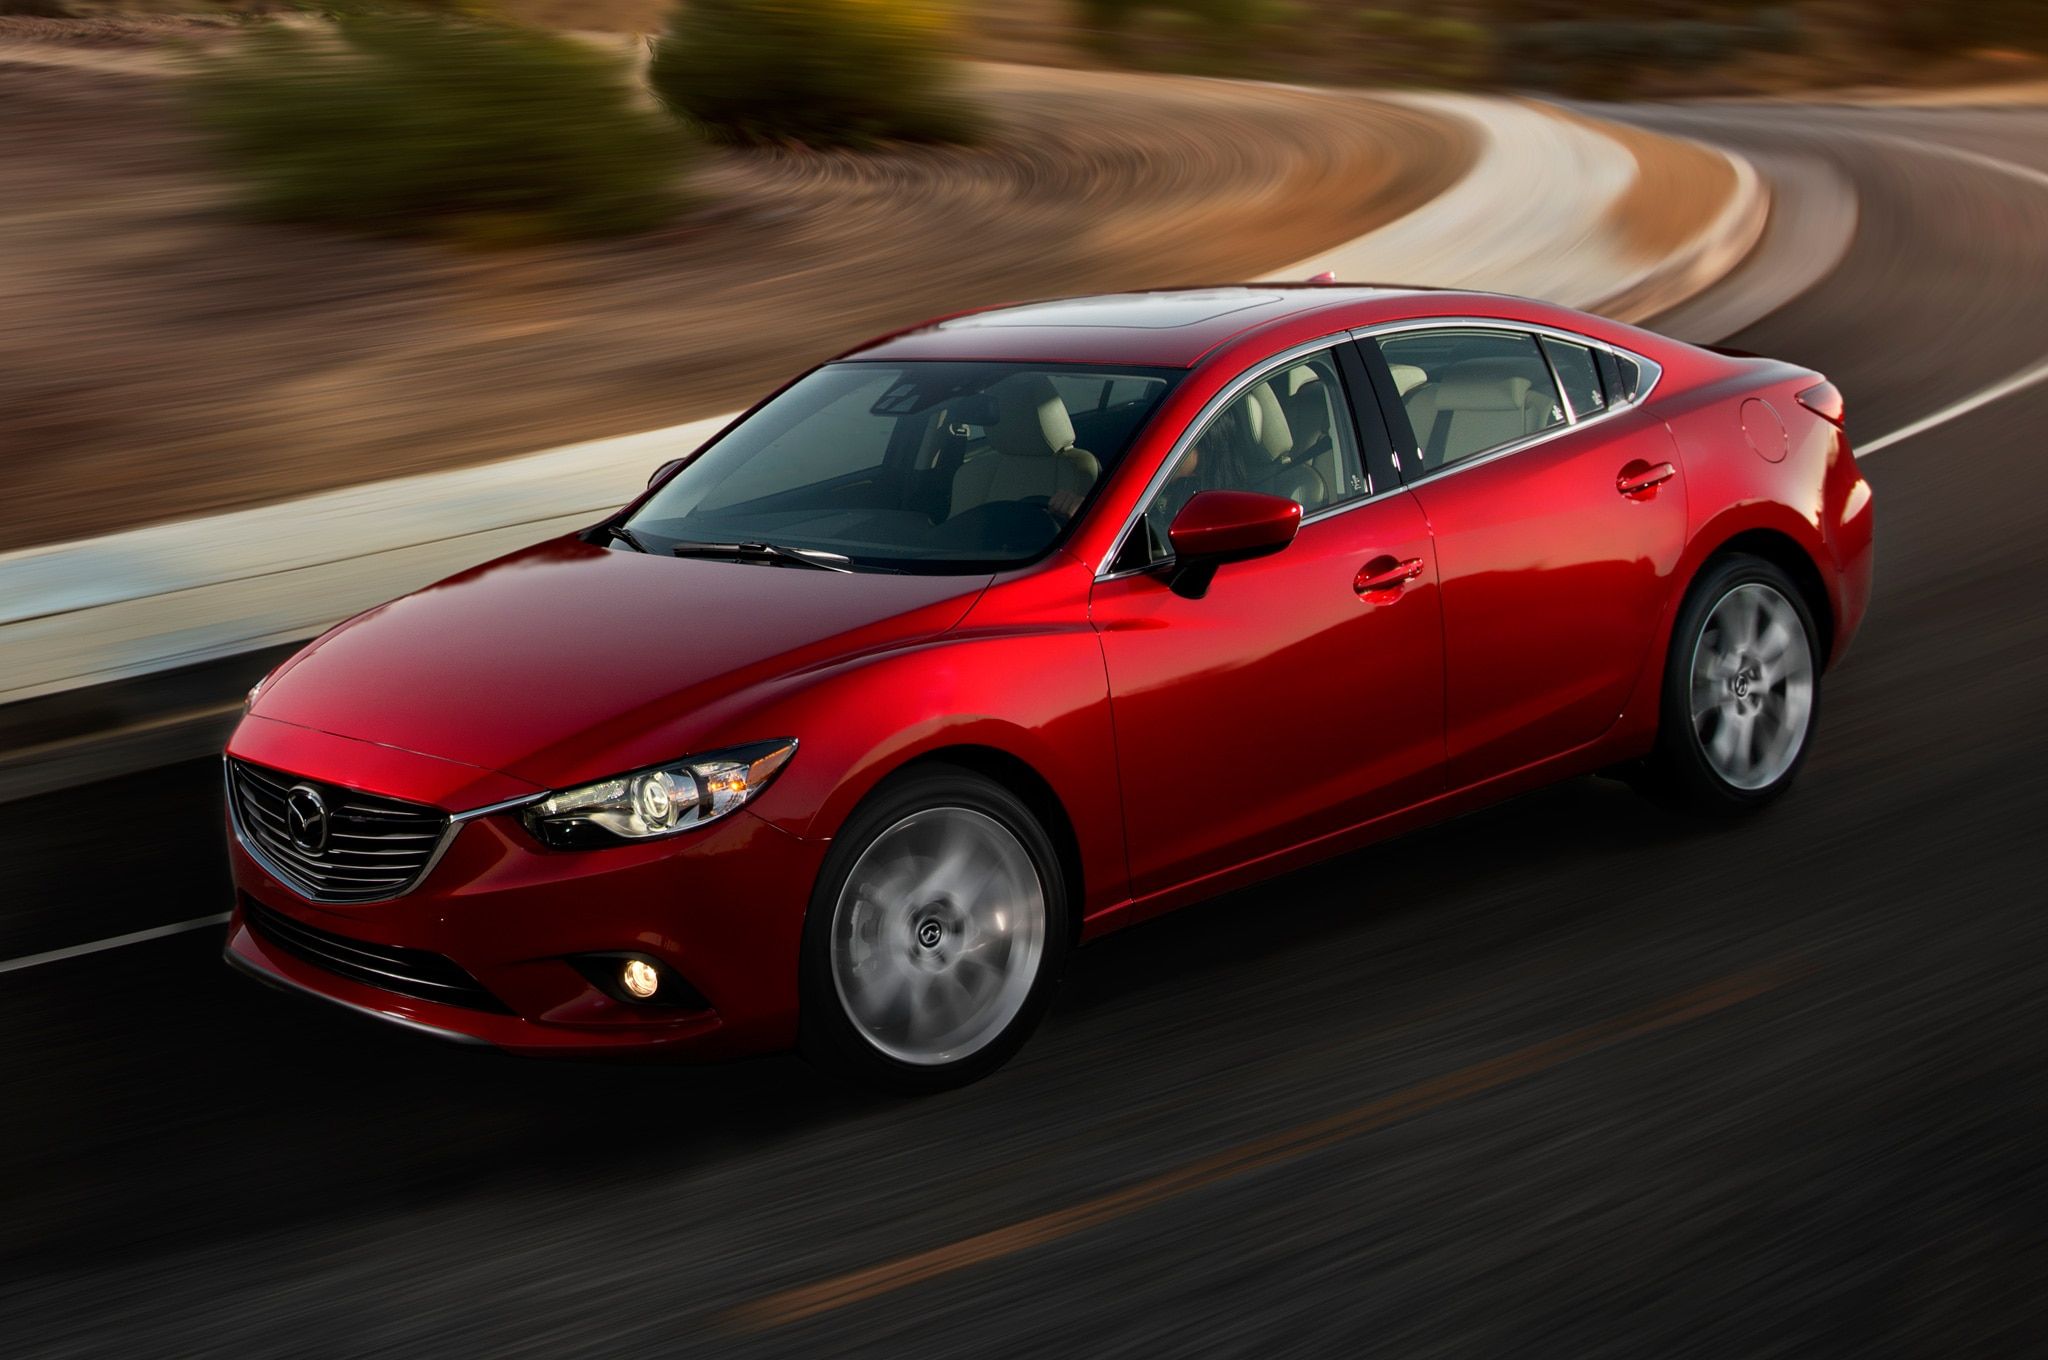 2014 Mazda 6 Gains Regenerative Braking, 40 MPG Rating   Photos